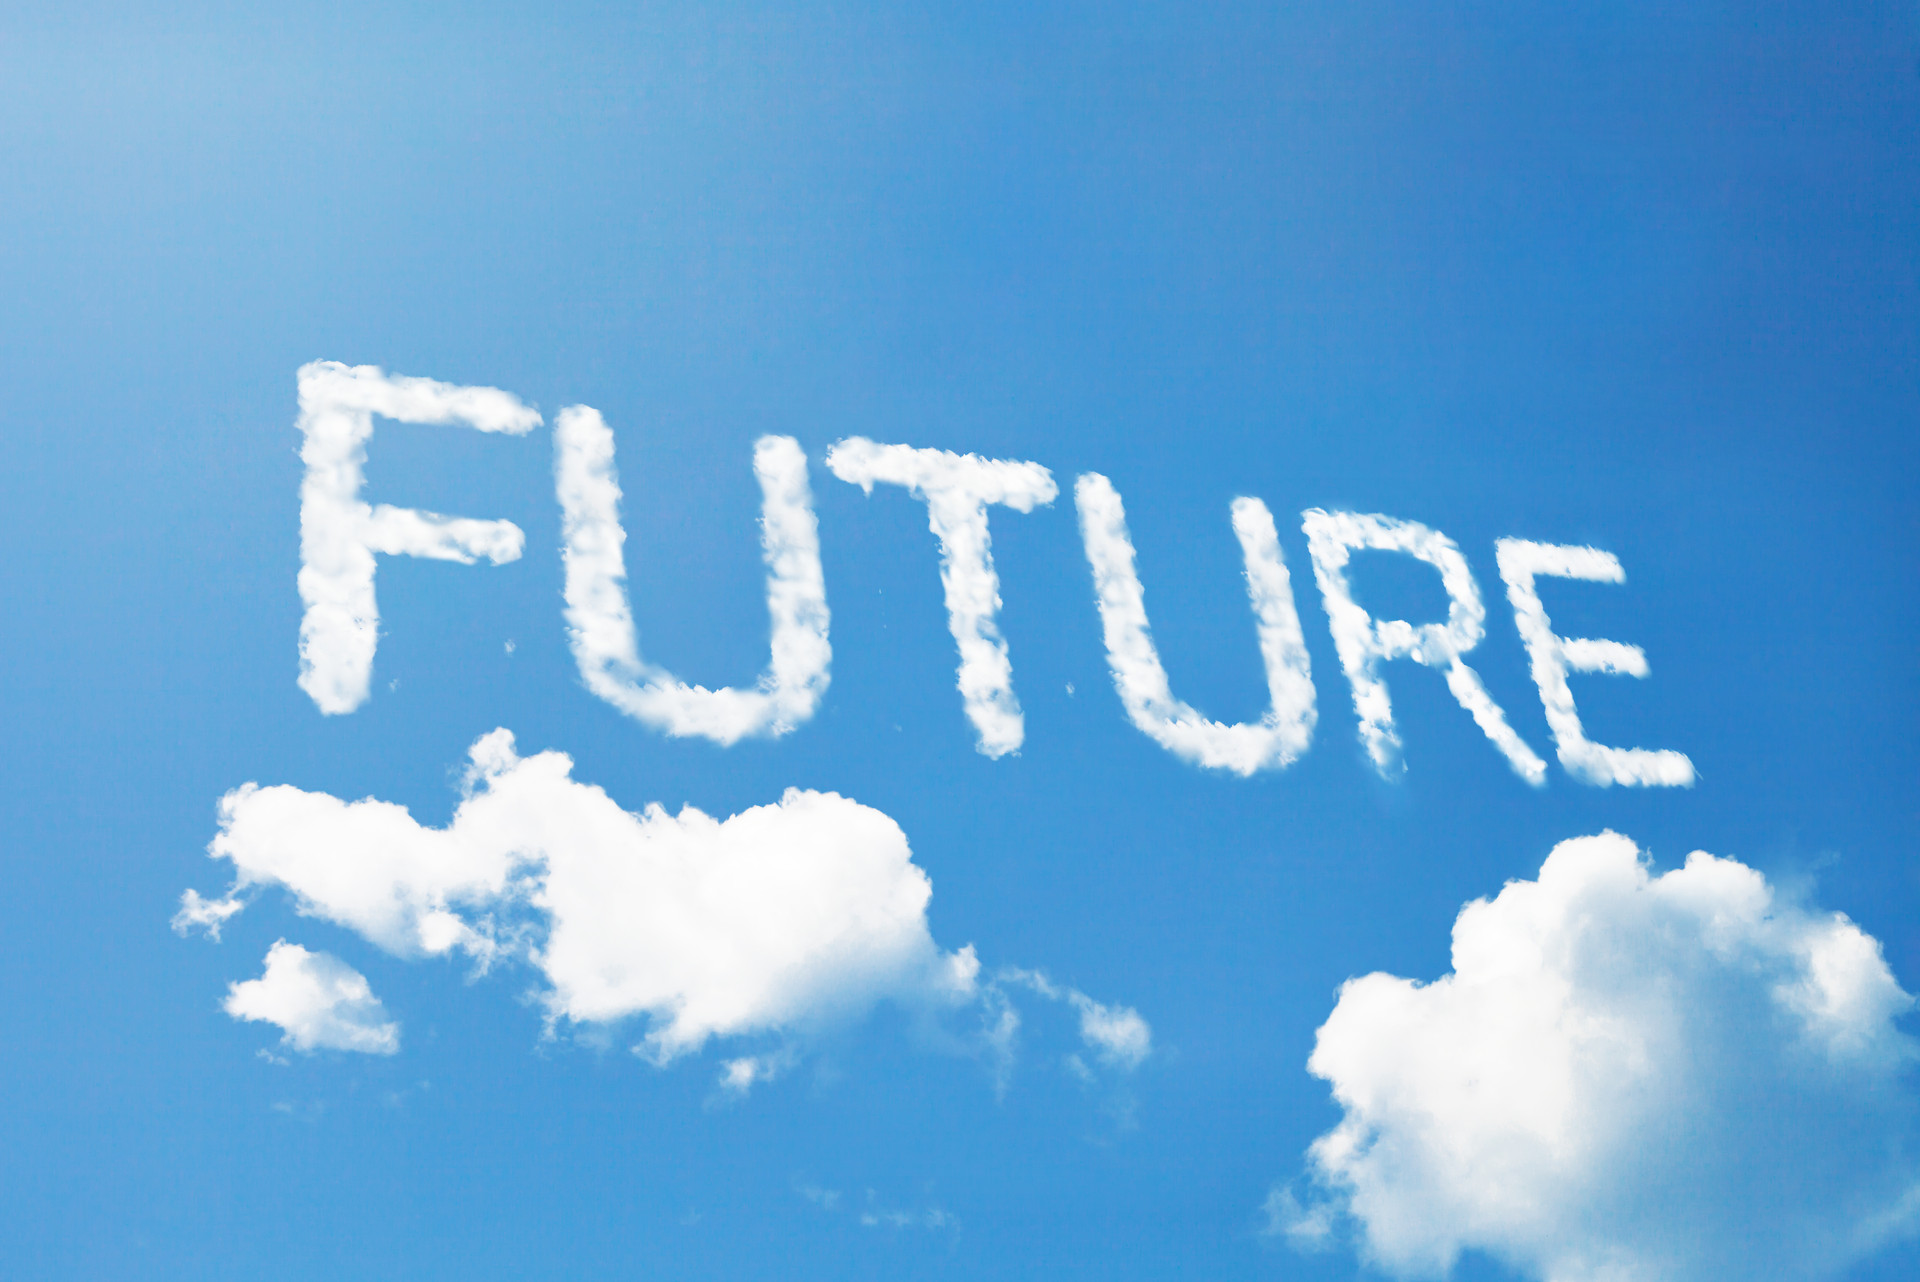 170 Future Banner.jpg